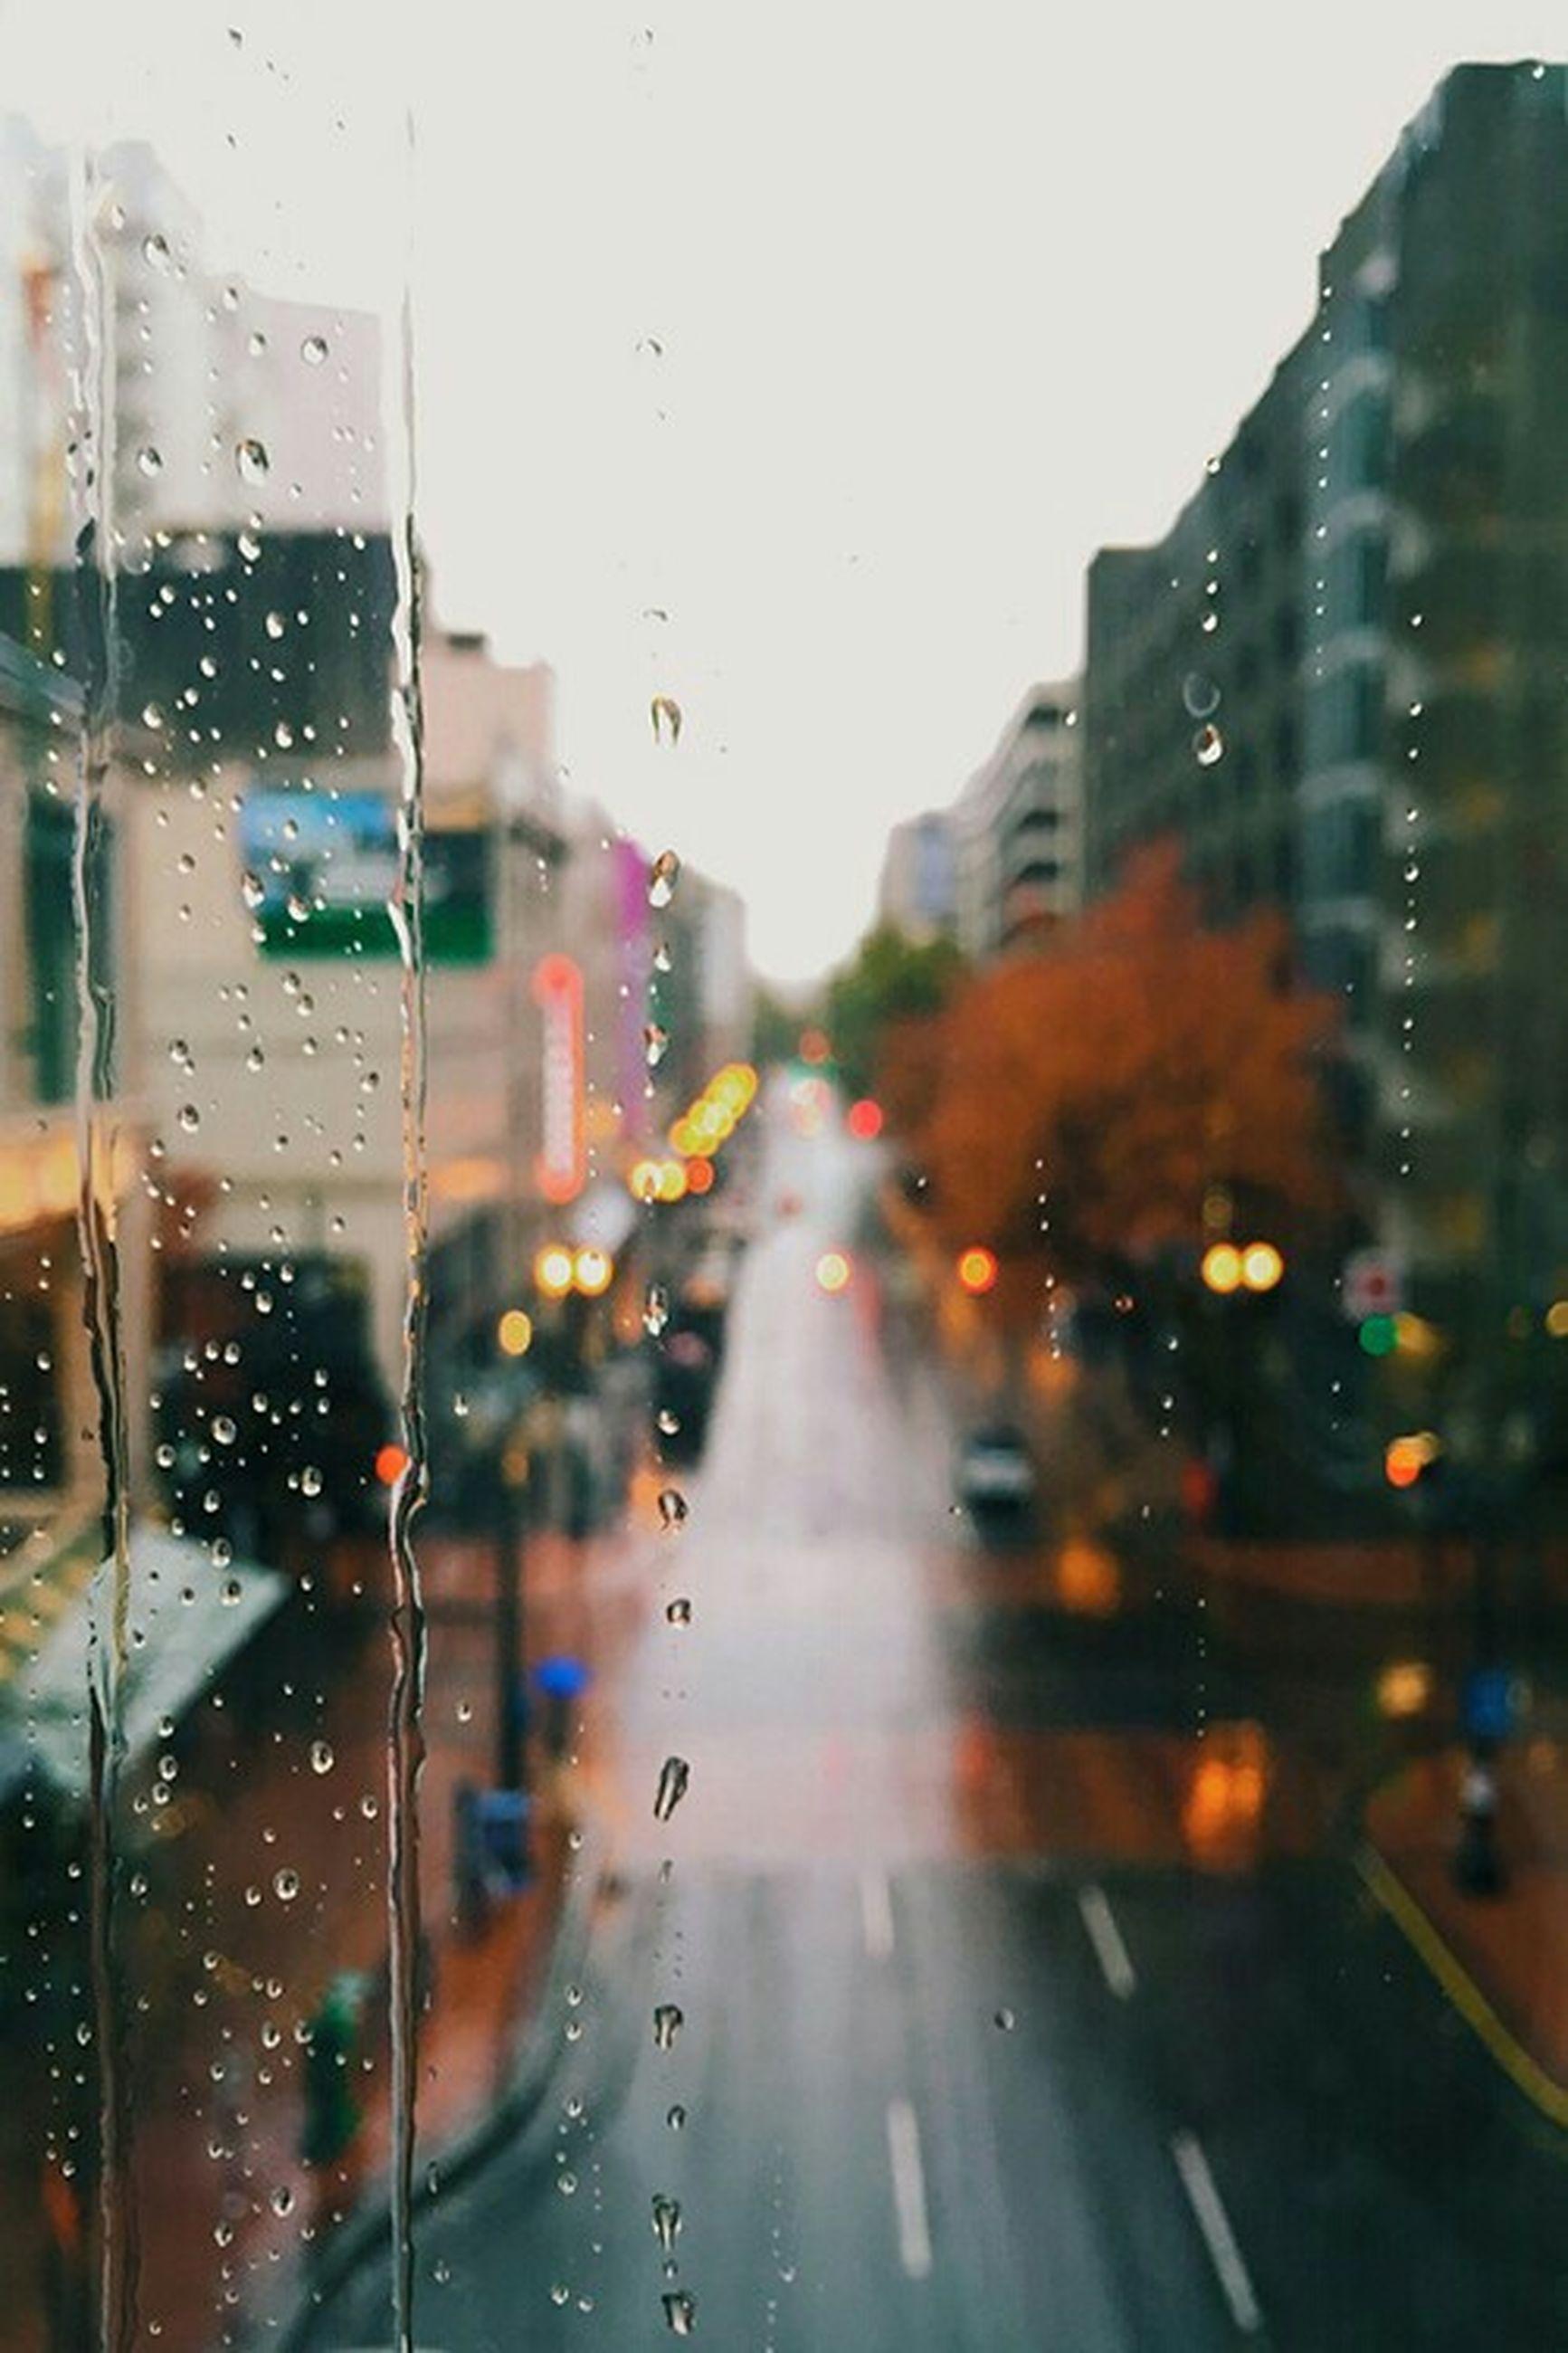 wet, transportation, drop, rain, car, window, transparent, glass - material, land vehicle, mode of transport, indoors, season, city, weather, raindrop, road, street, the way forward, built structure, architecture